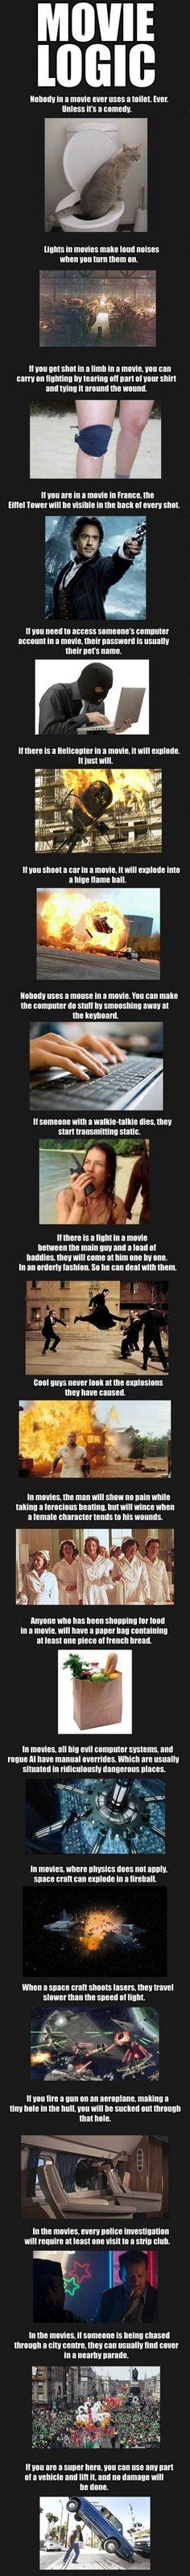 #Funny #Movie #Logics